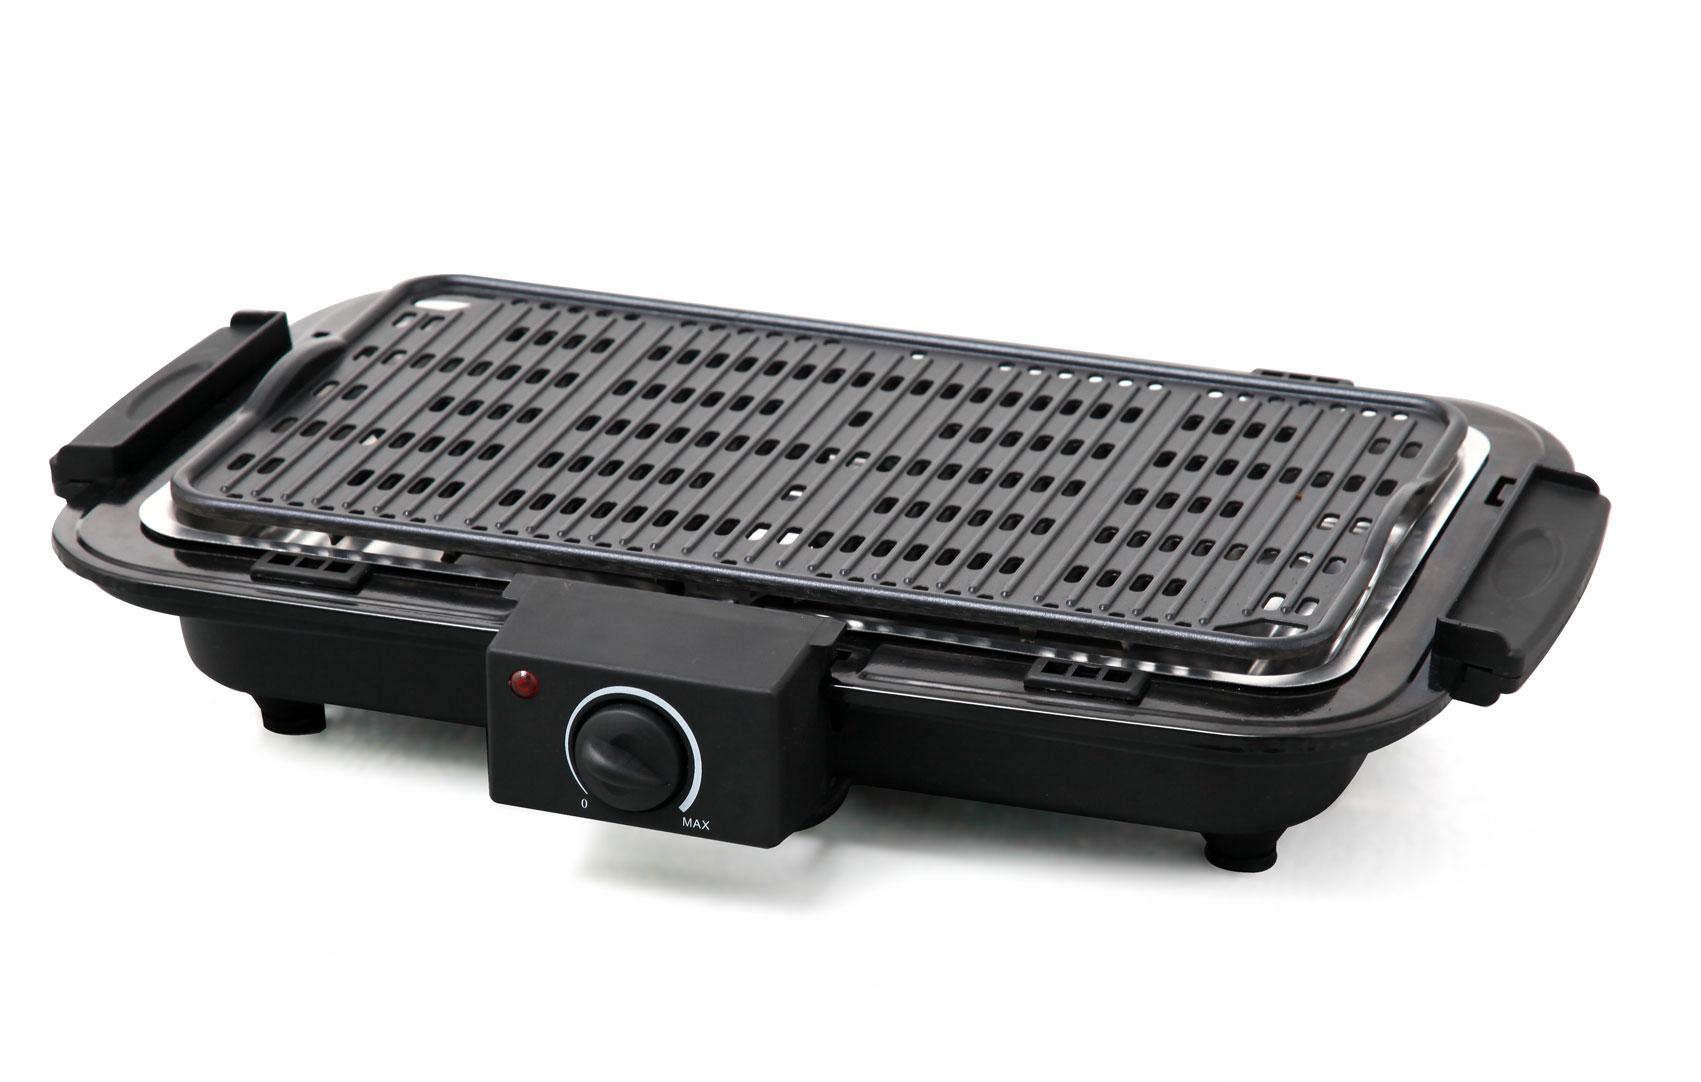 elektro grill severin pg 1511 barbecue elektrogrill. Black Bedroom Furniture Sets. Home Design Ideas